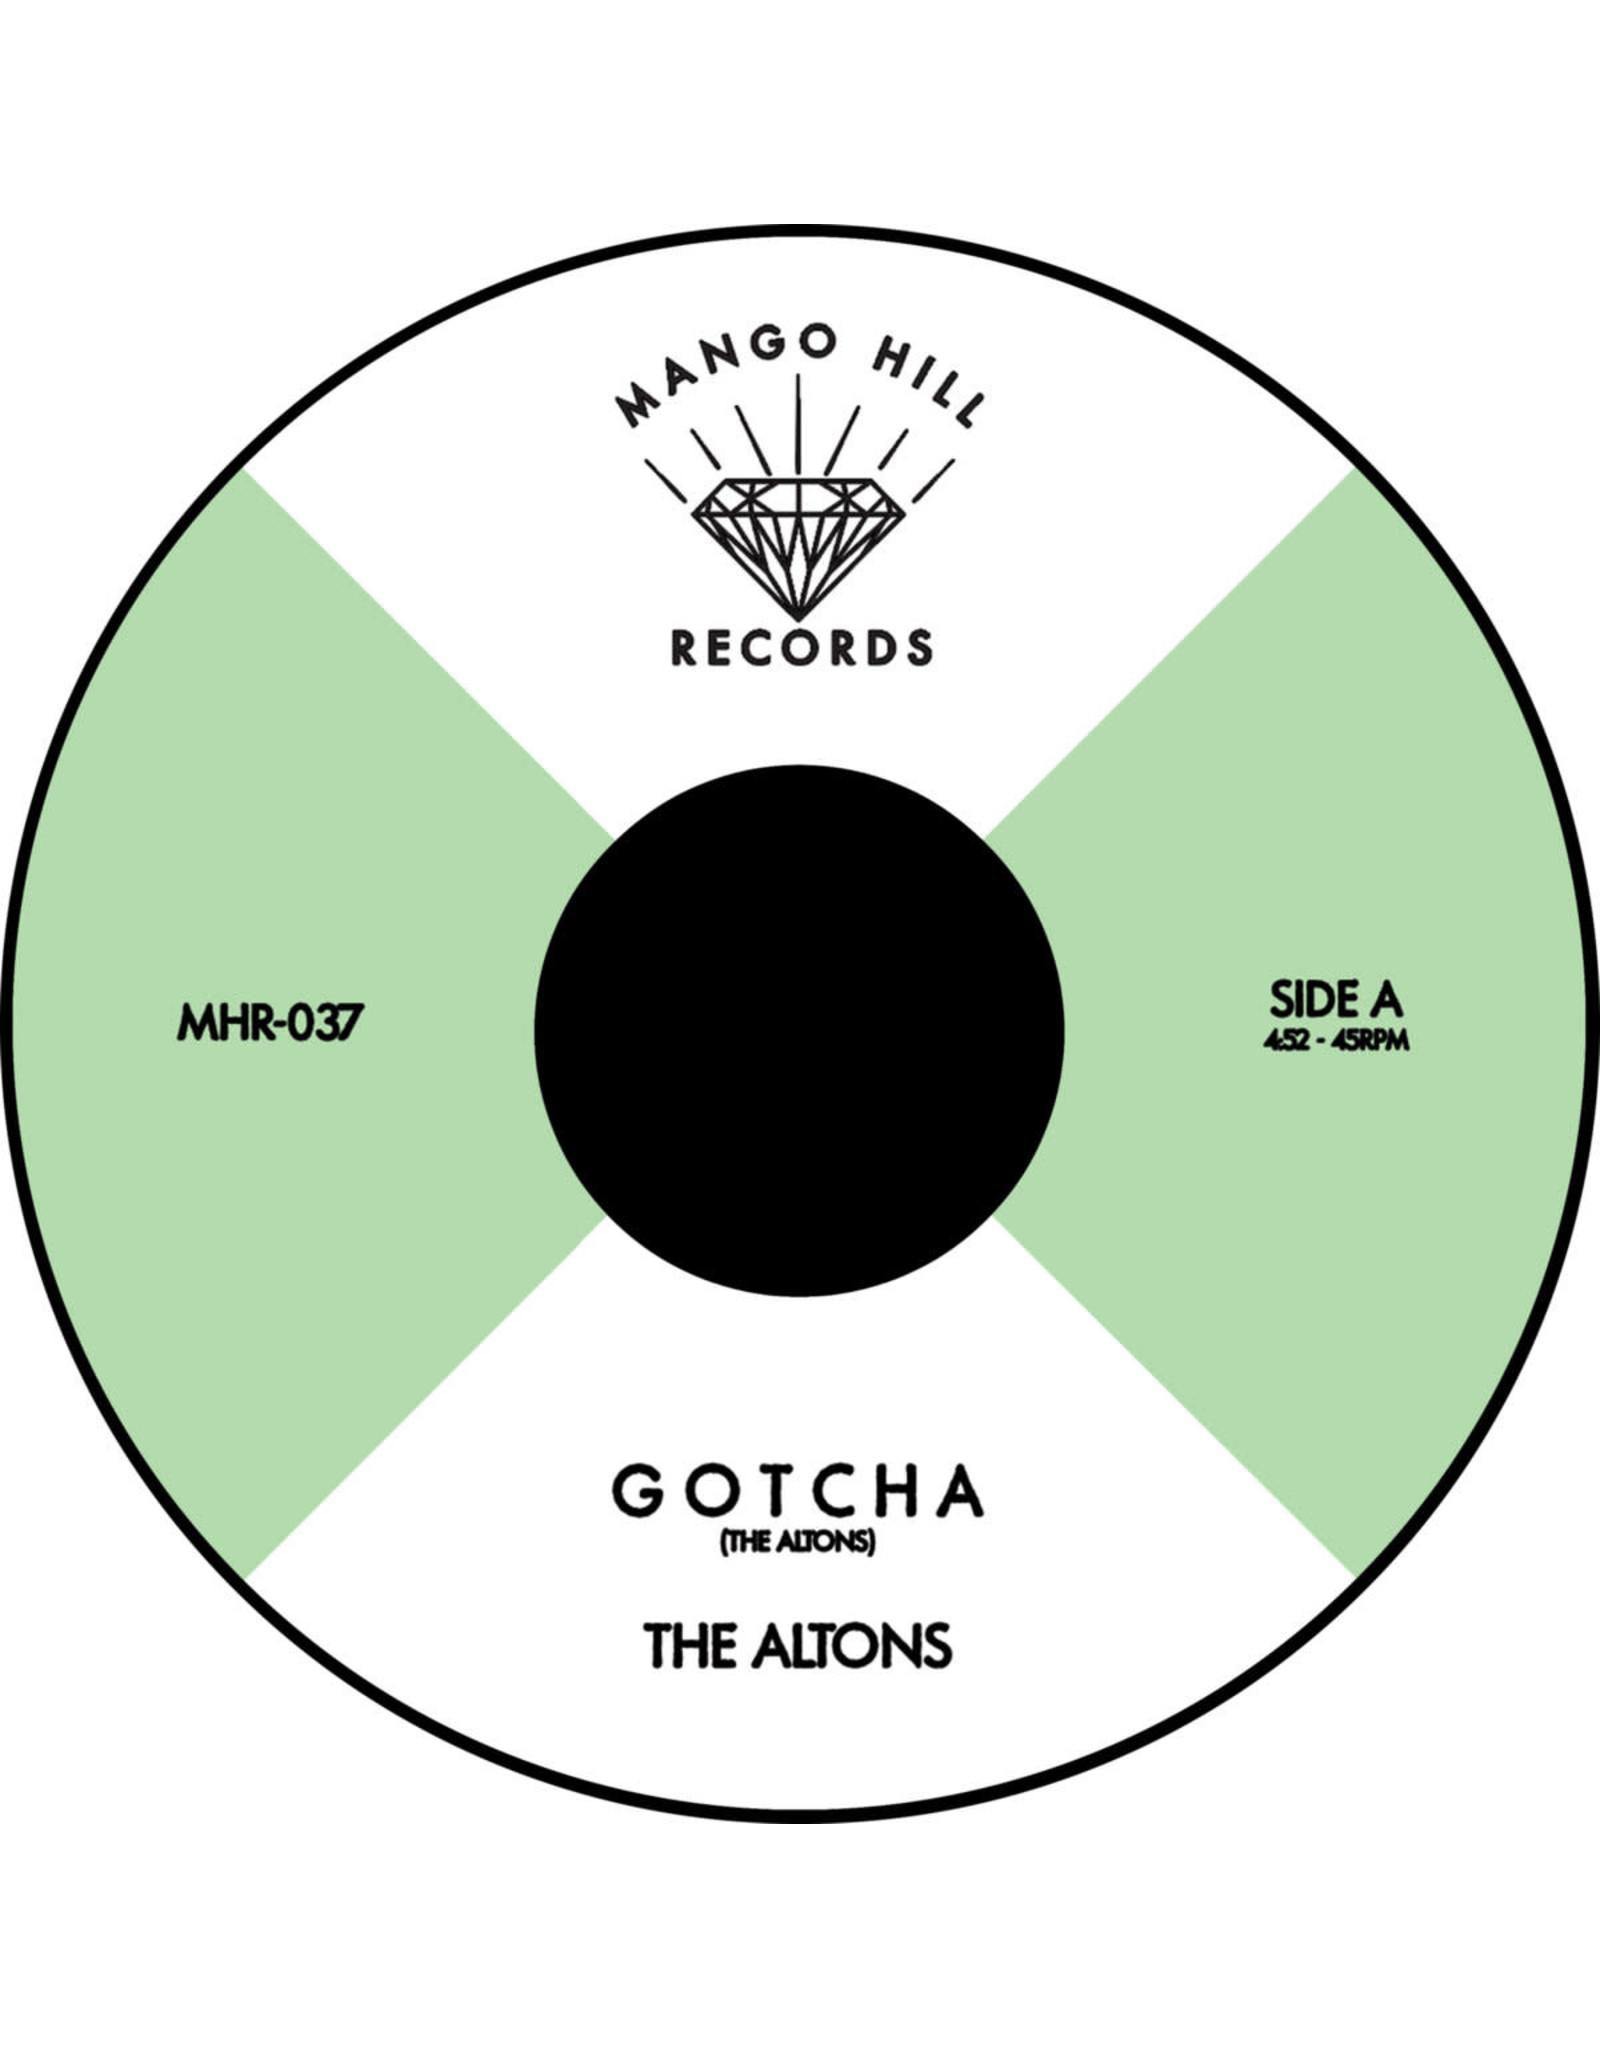 "New Vinyl The Altons - Gotcha b/w Maldito (Coke Bottle Clear) 7"""